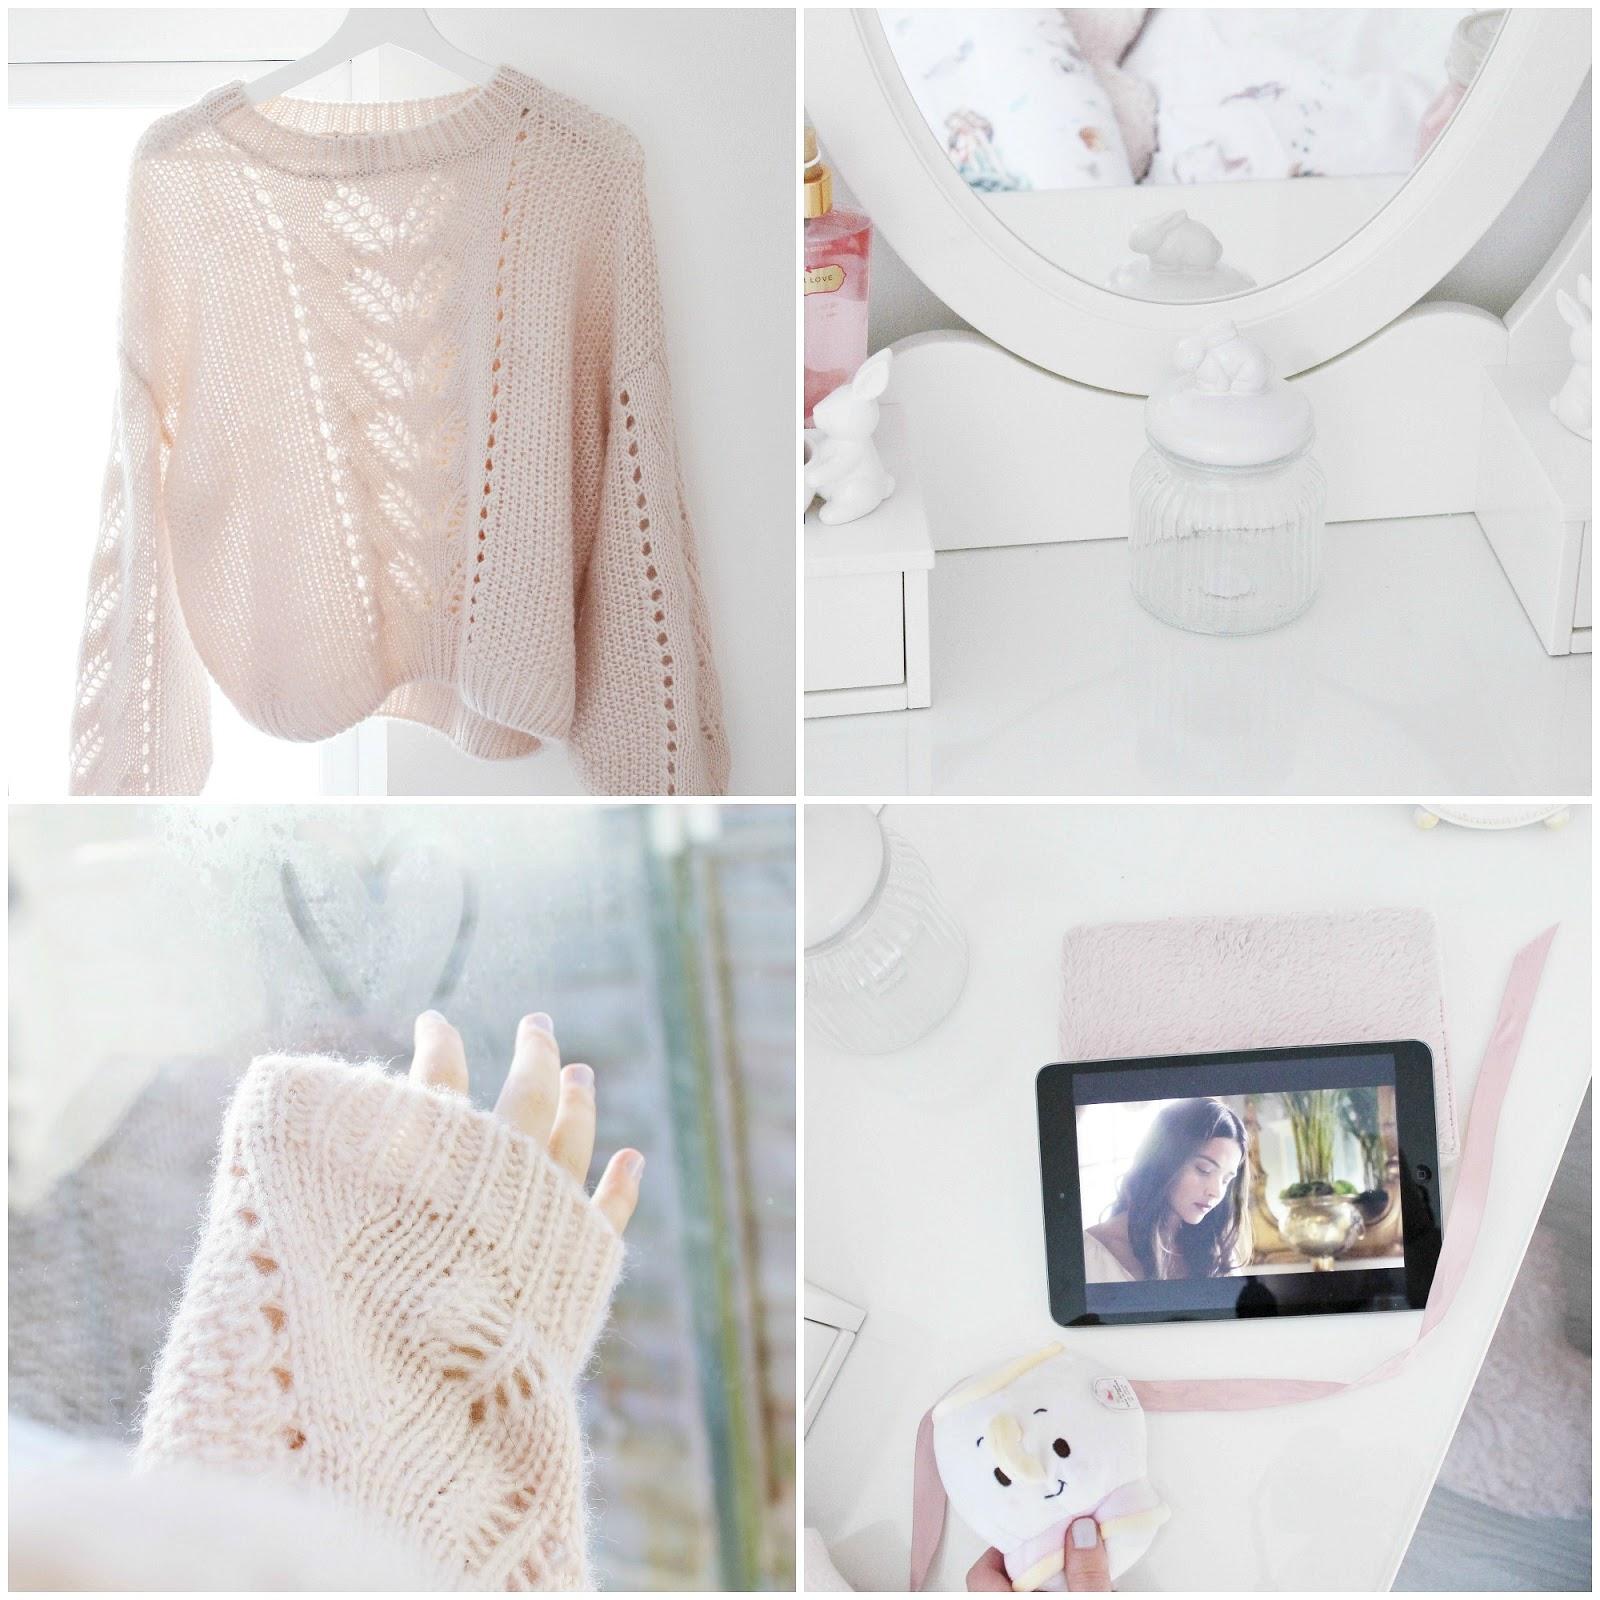 February girly pastel blog photo diary